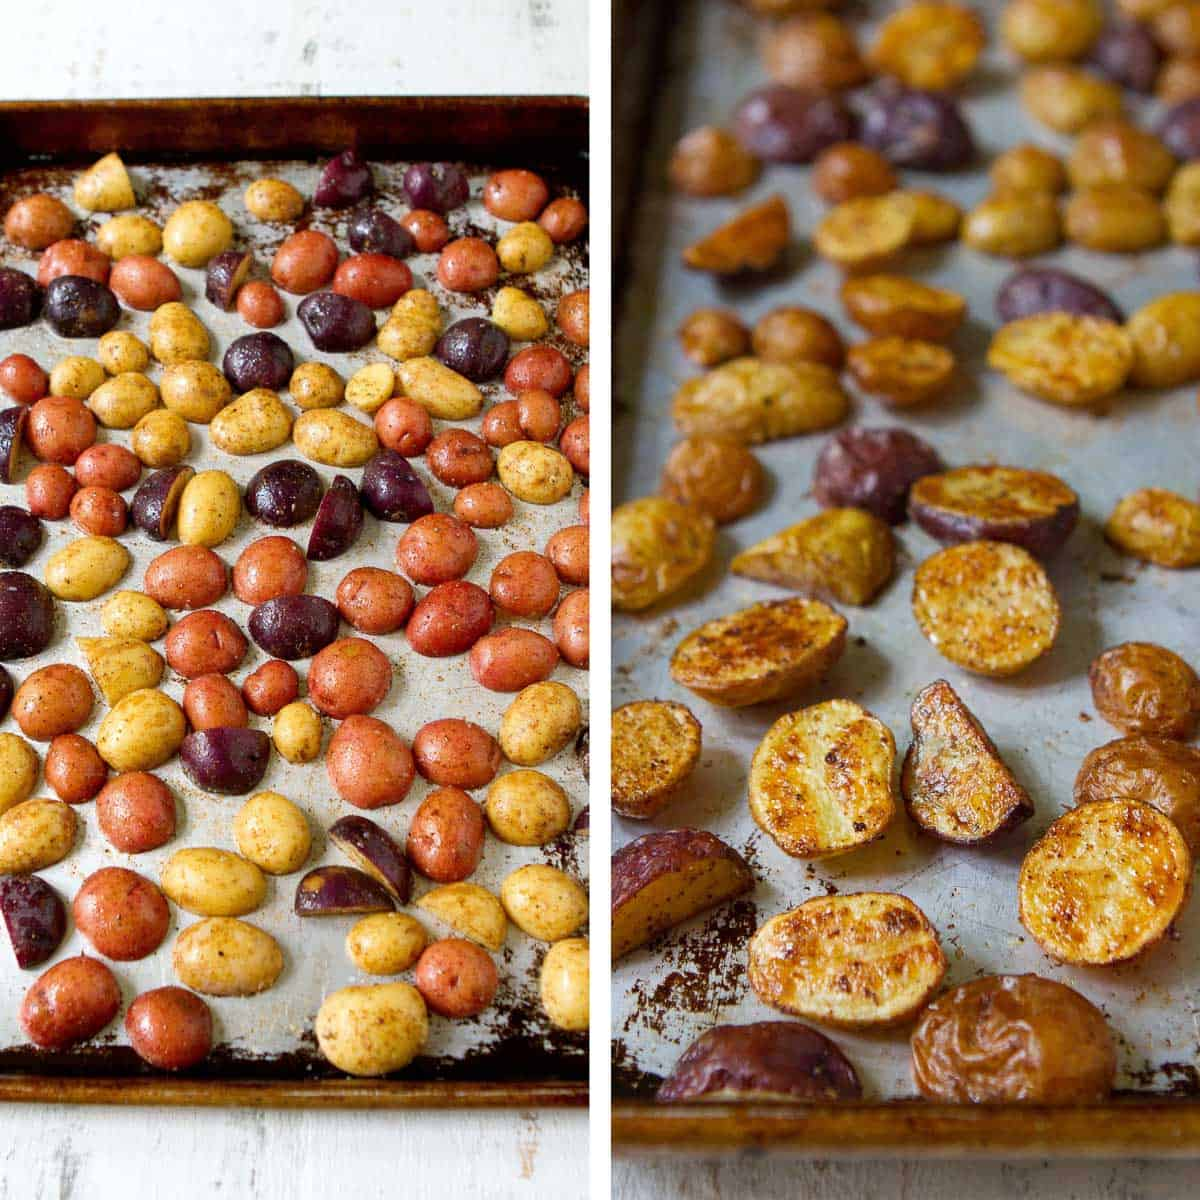 Raw potatoes and roasted mini potatoes on a baking sheet.